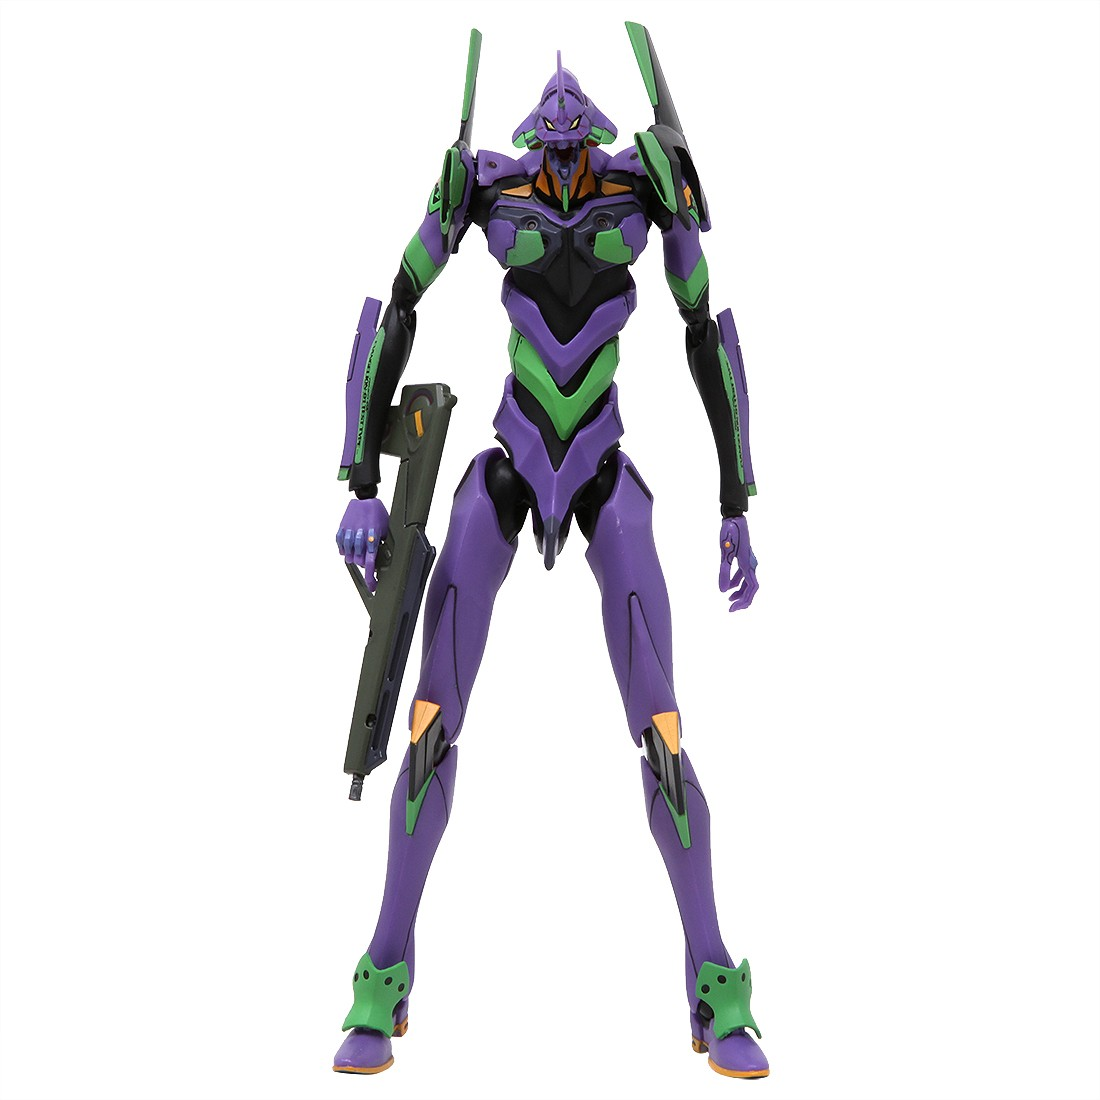 Medicom Neon Genesis Evangelion Shogoki MAFEX Figure (purple)